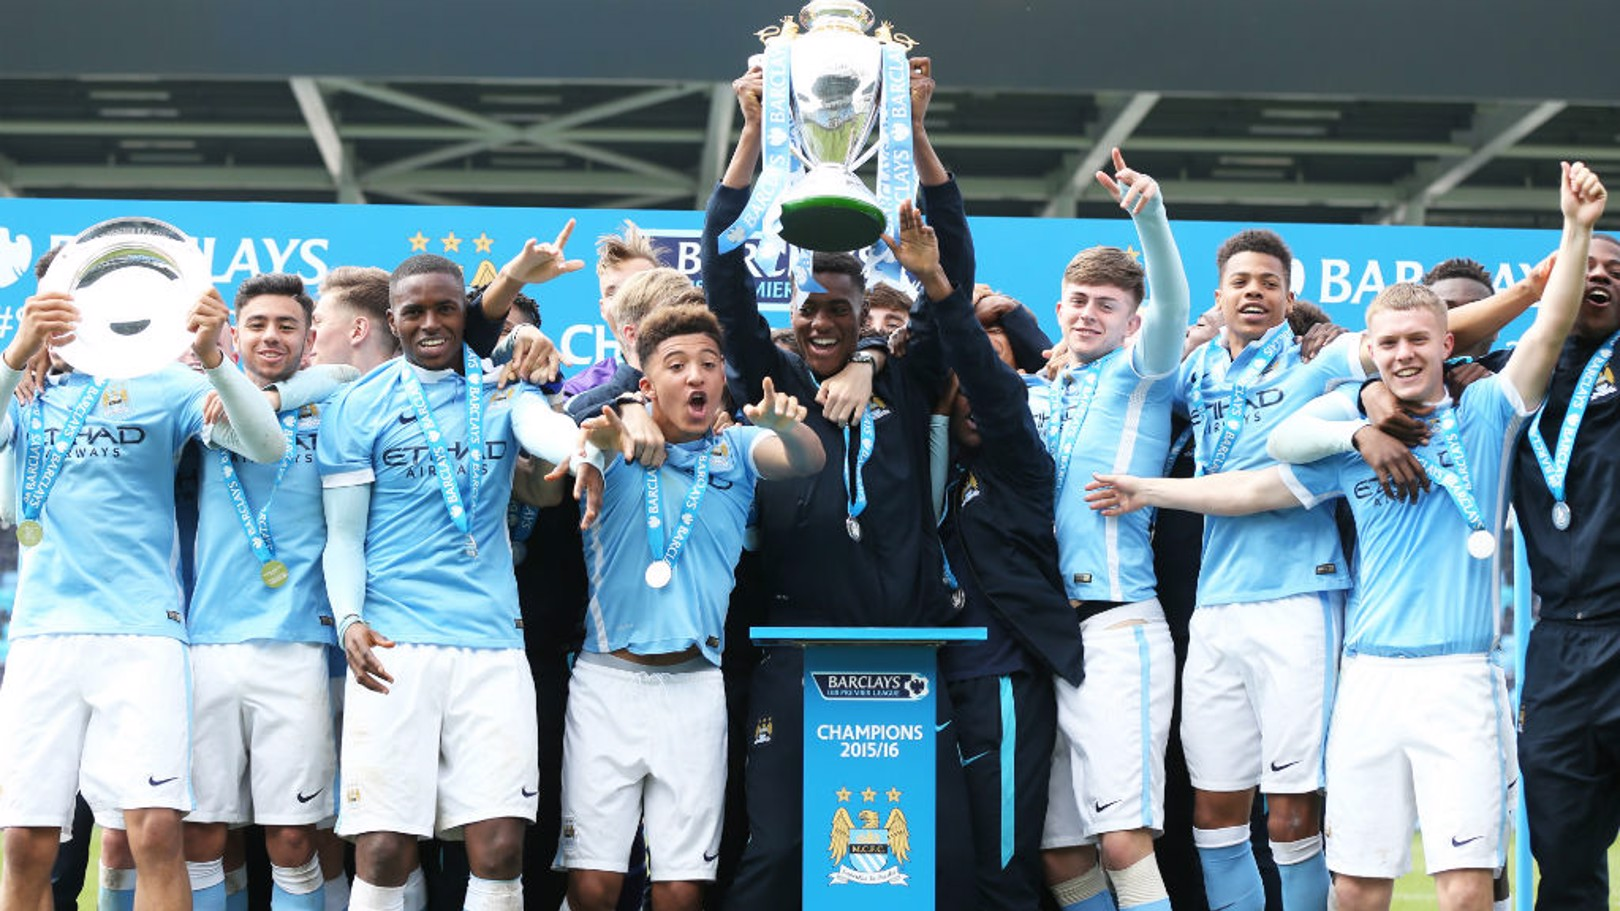 TROPHY HAUL: Can City U18s repeat the success of last season?